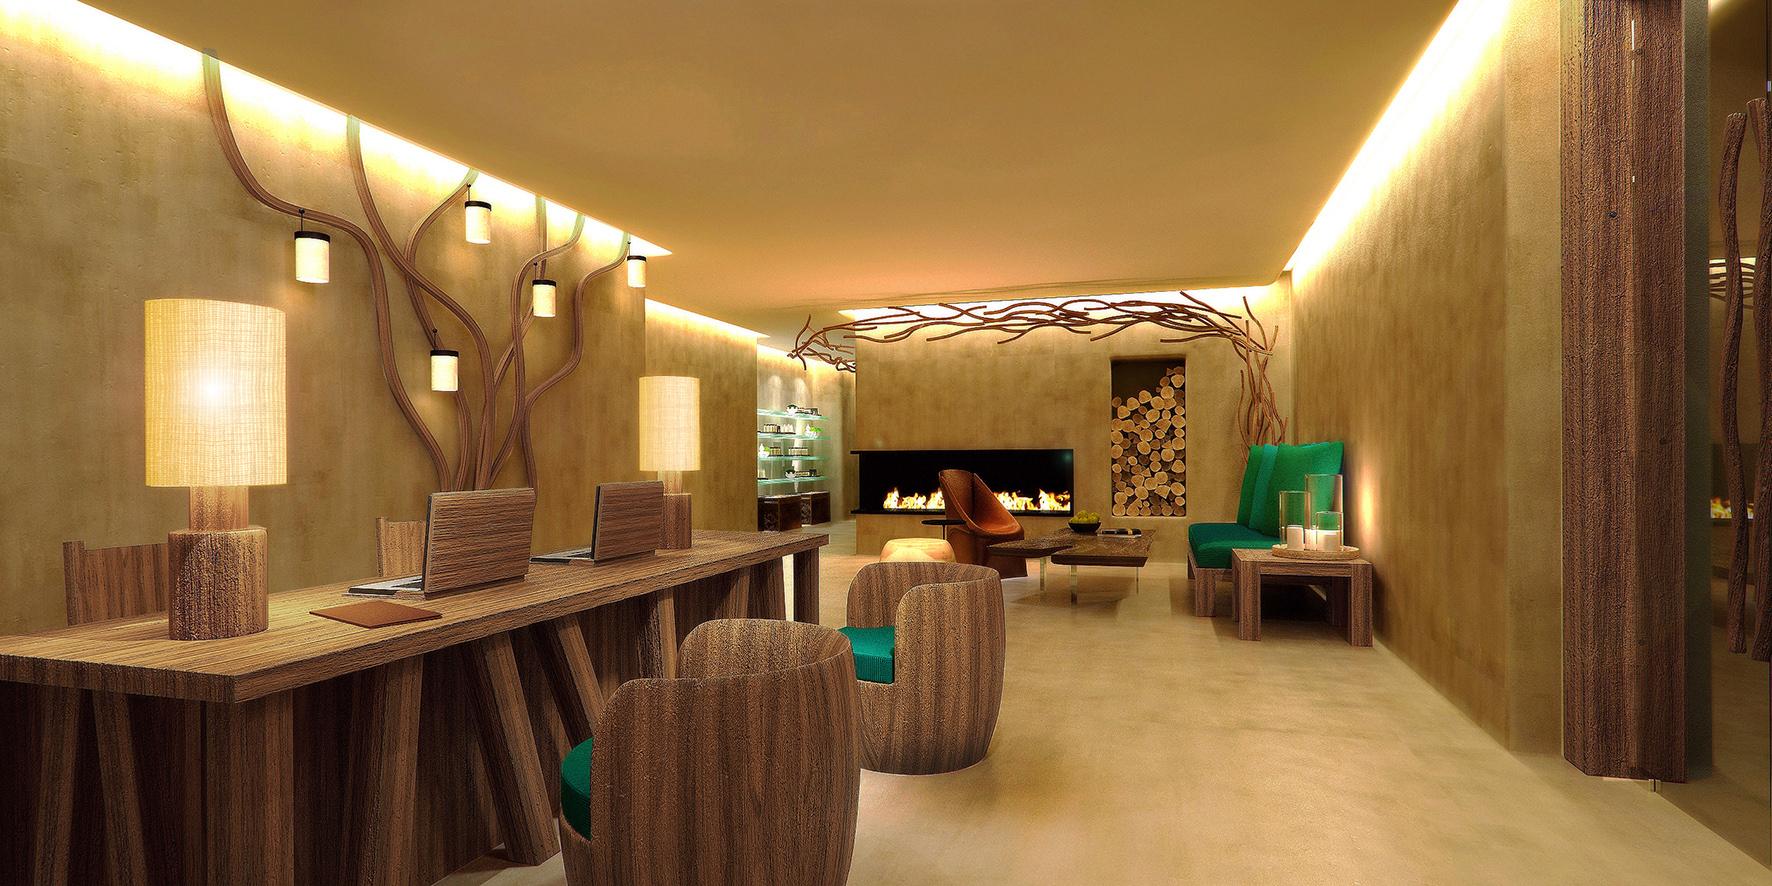 Six Senses Hotels Resorts And Spas Hospitality Net